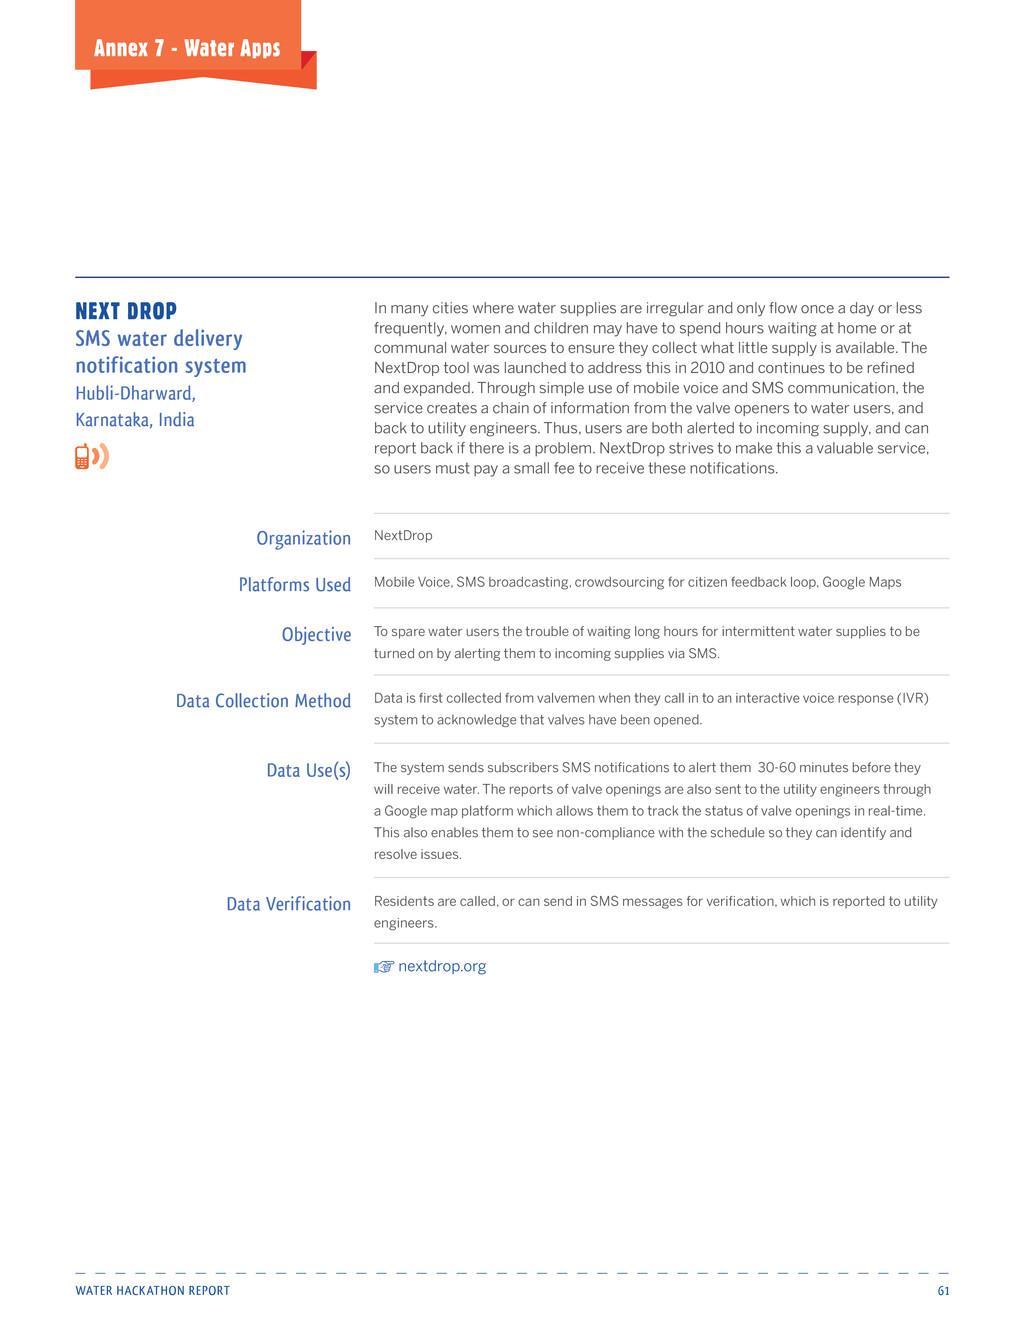 Water Hackathon Report 61 Annex 7 - Water Apps ...